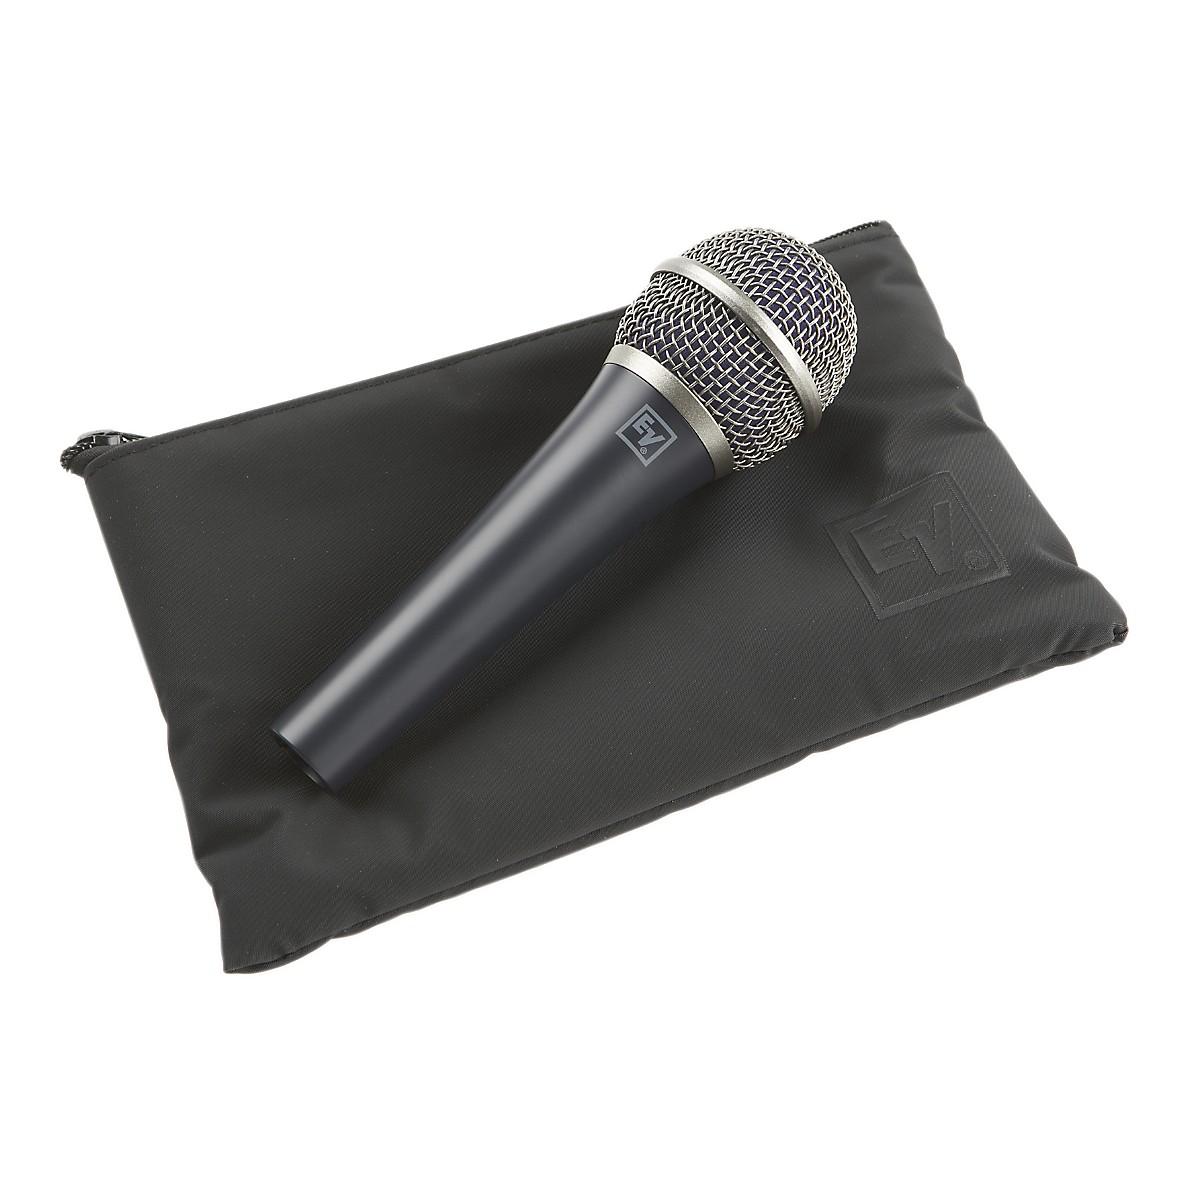 Electro-Voice Co9 Cobalt Premium Vocal Microphone